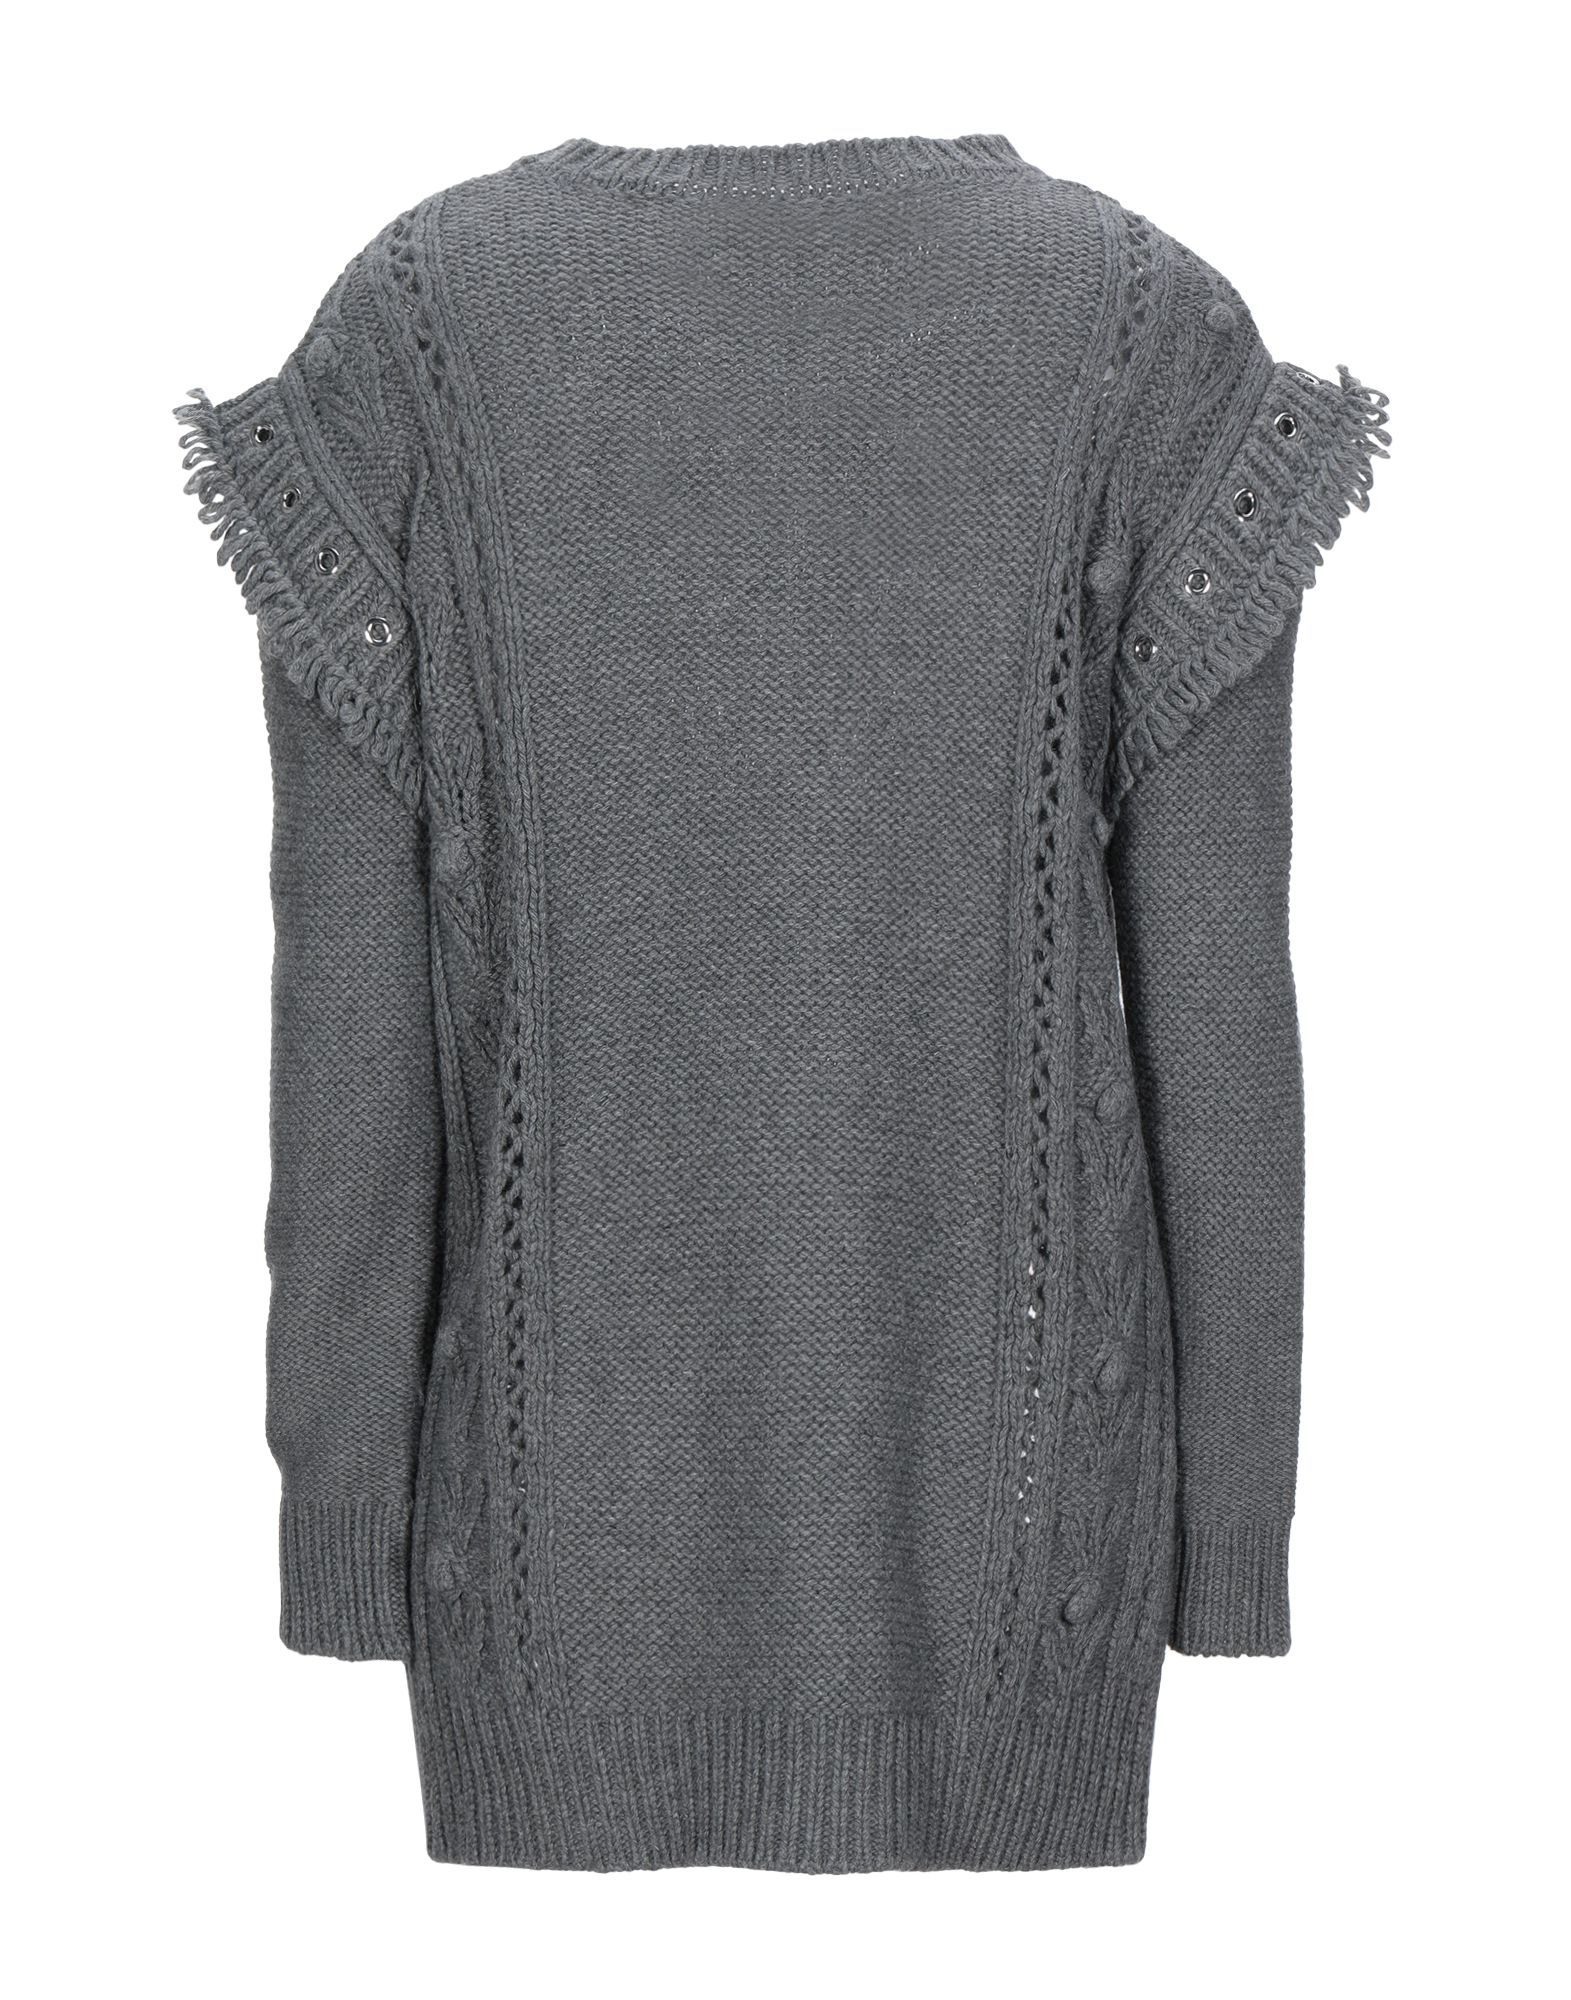 Redvalentino Lead Wool Knit Fringe Jumper